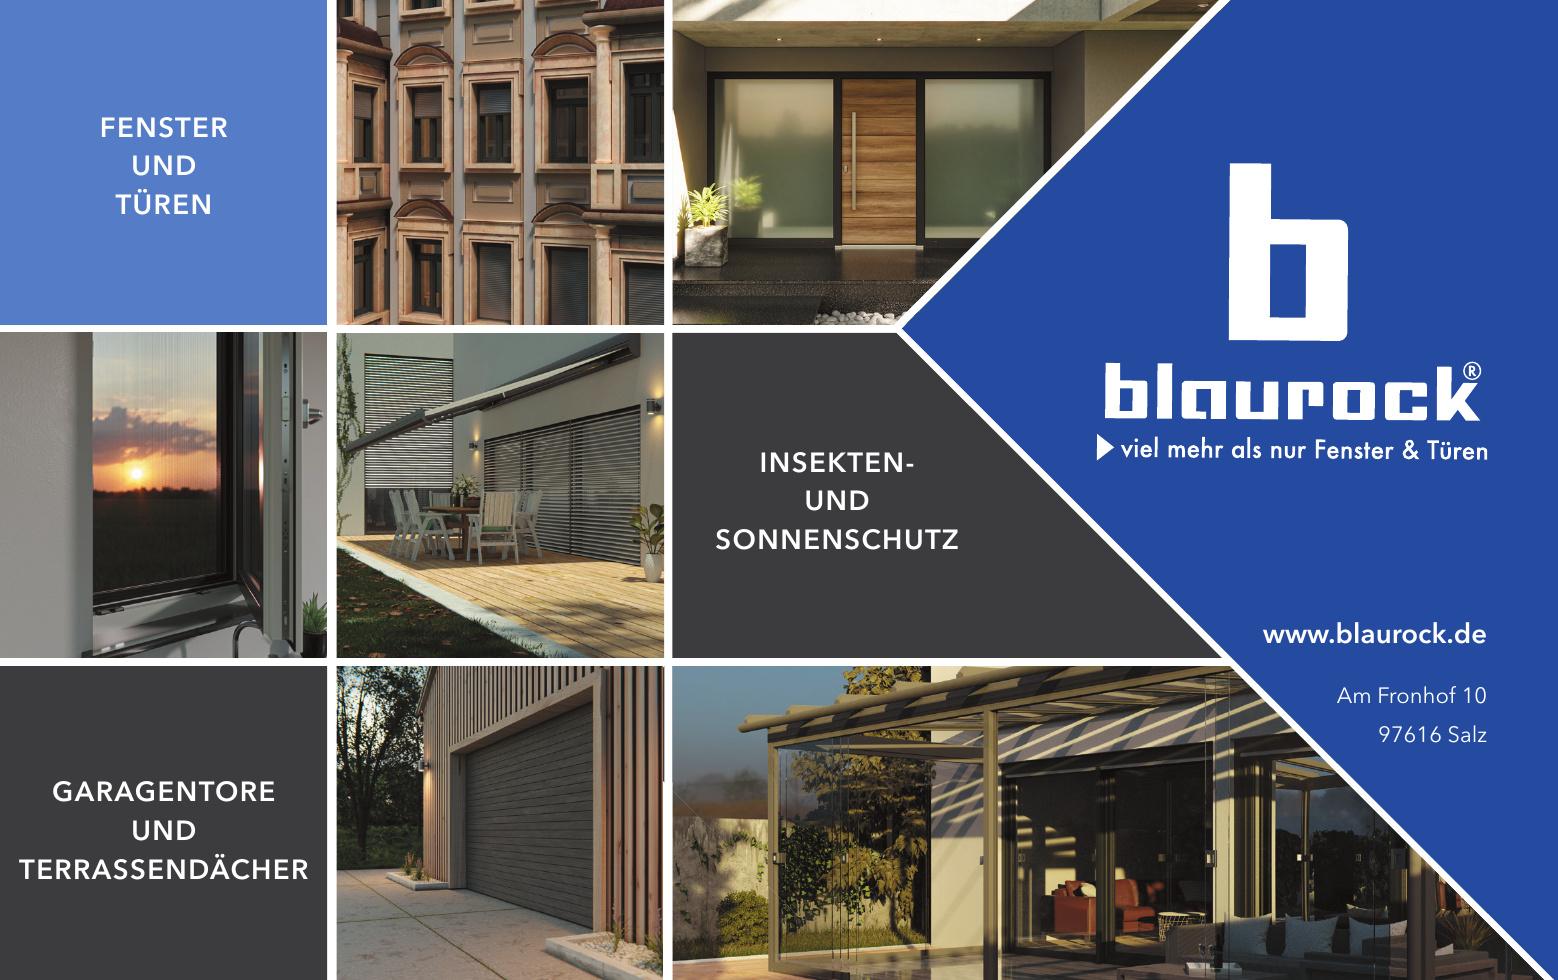 Blaurock GmbH